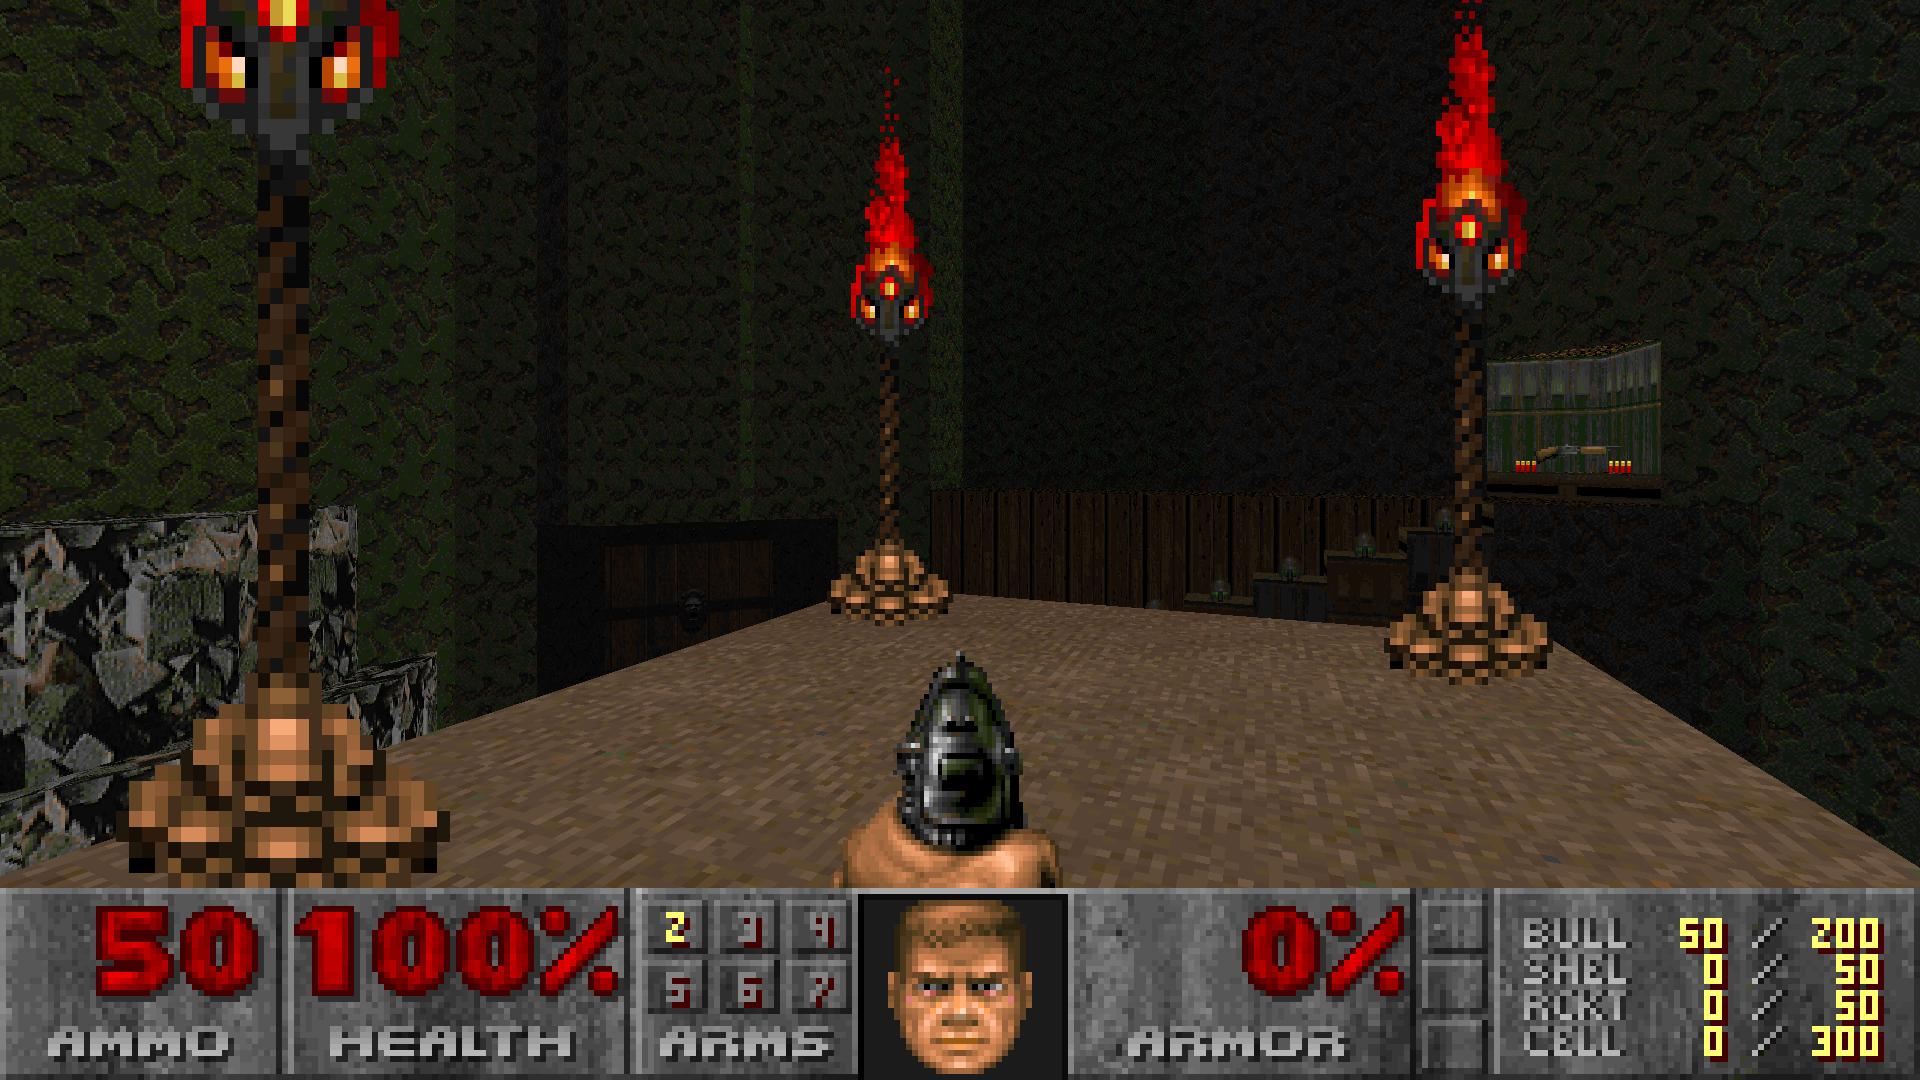 Screenshot_Doom_20190709_212156.png.dce19bae5ca1704bfa9cdd5830087709.png